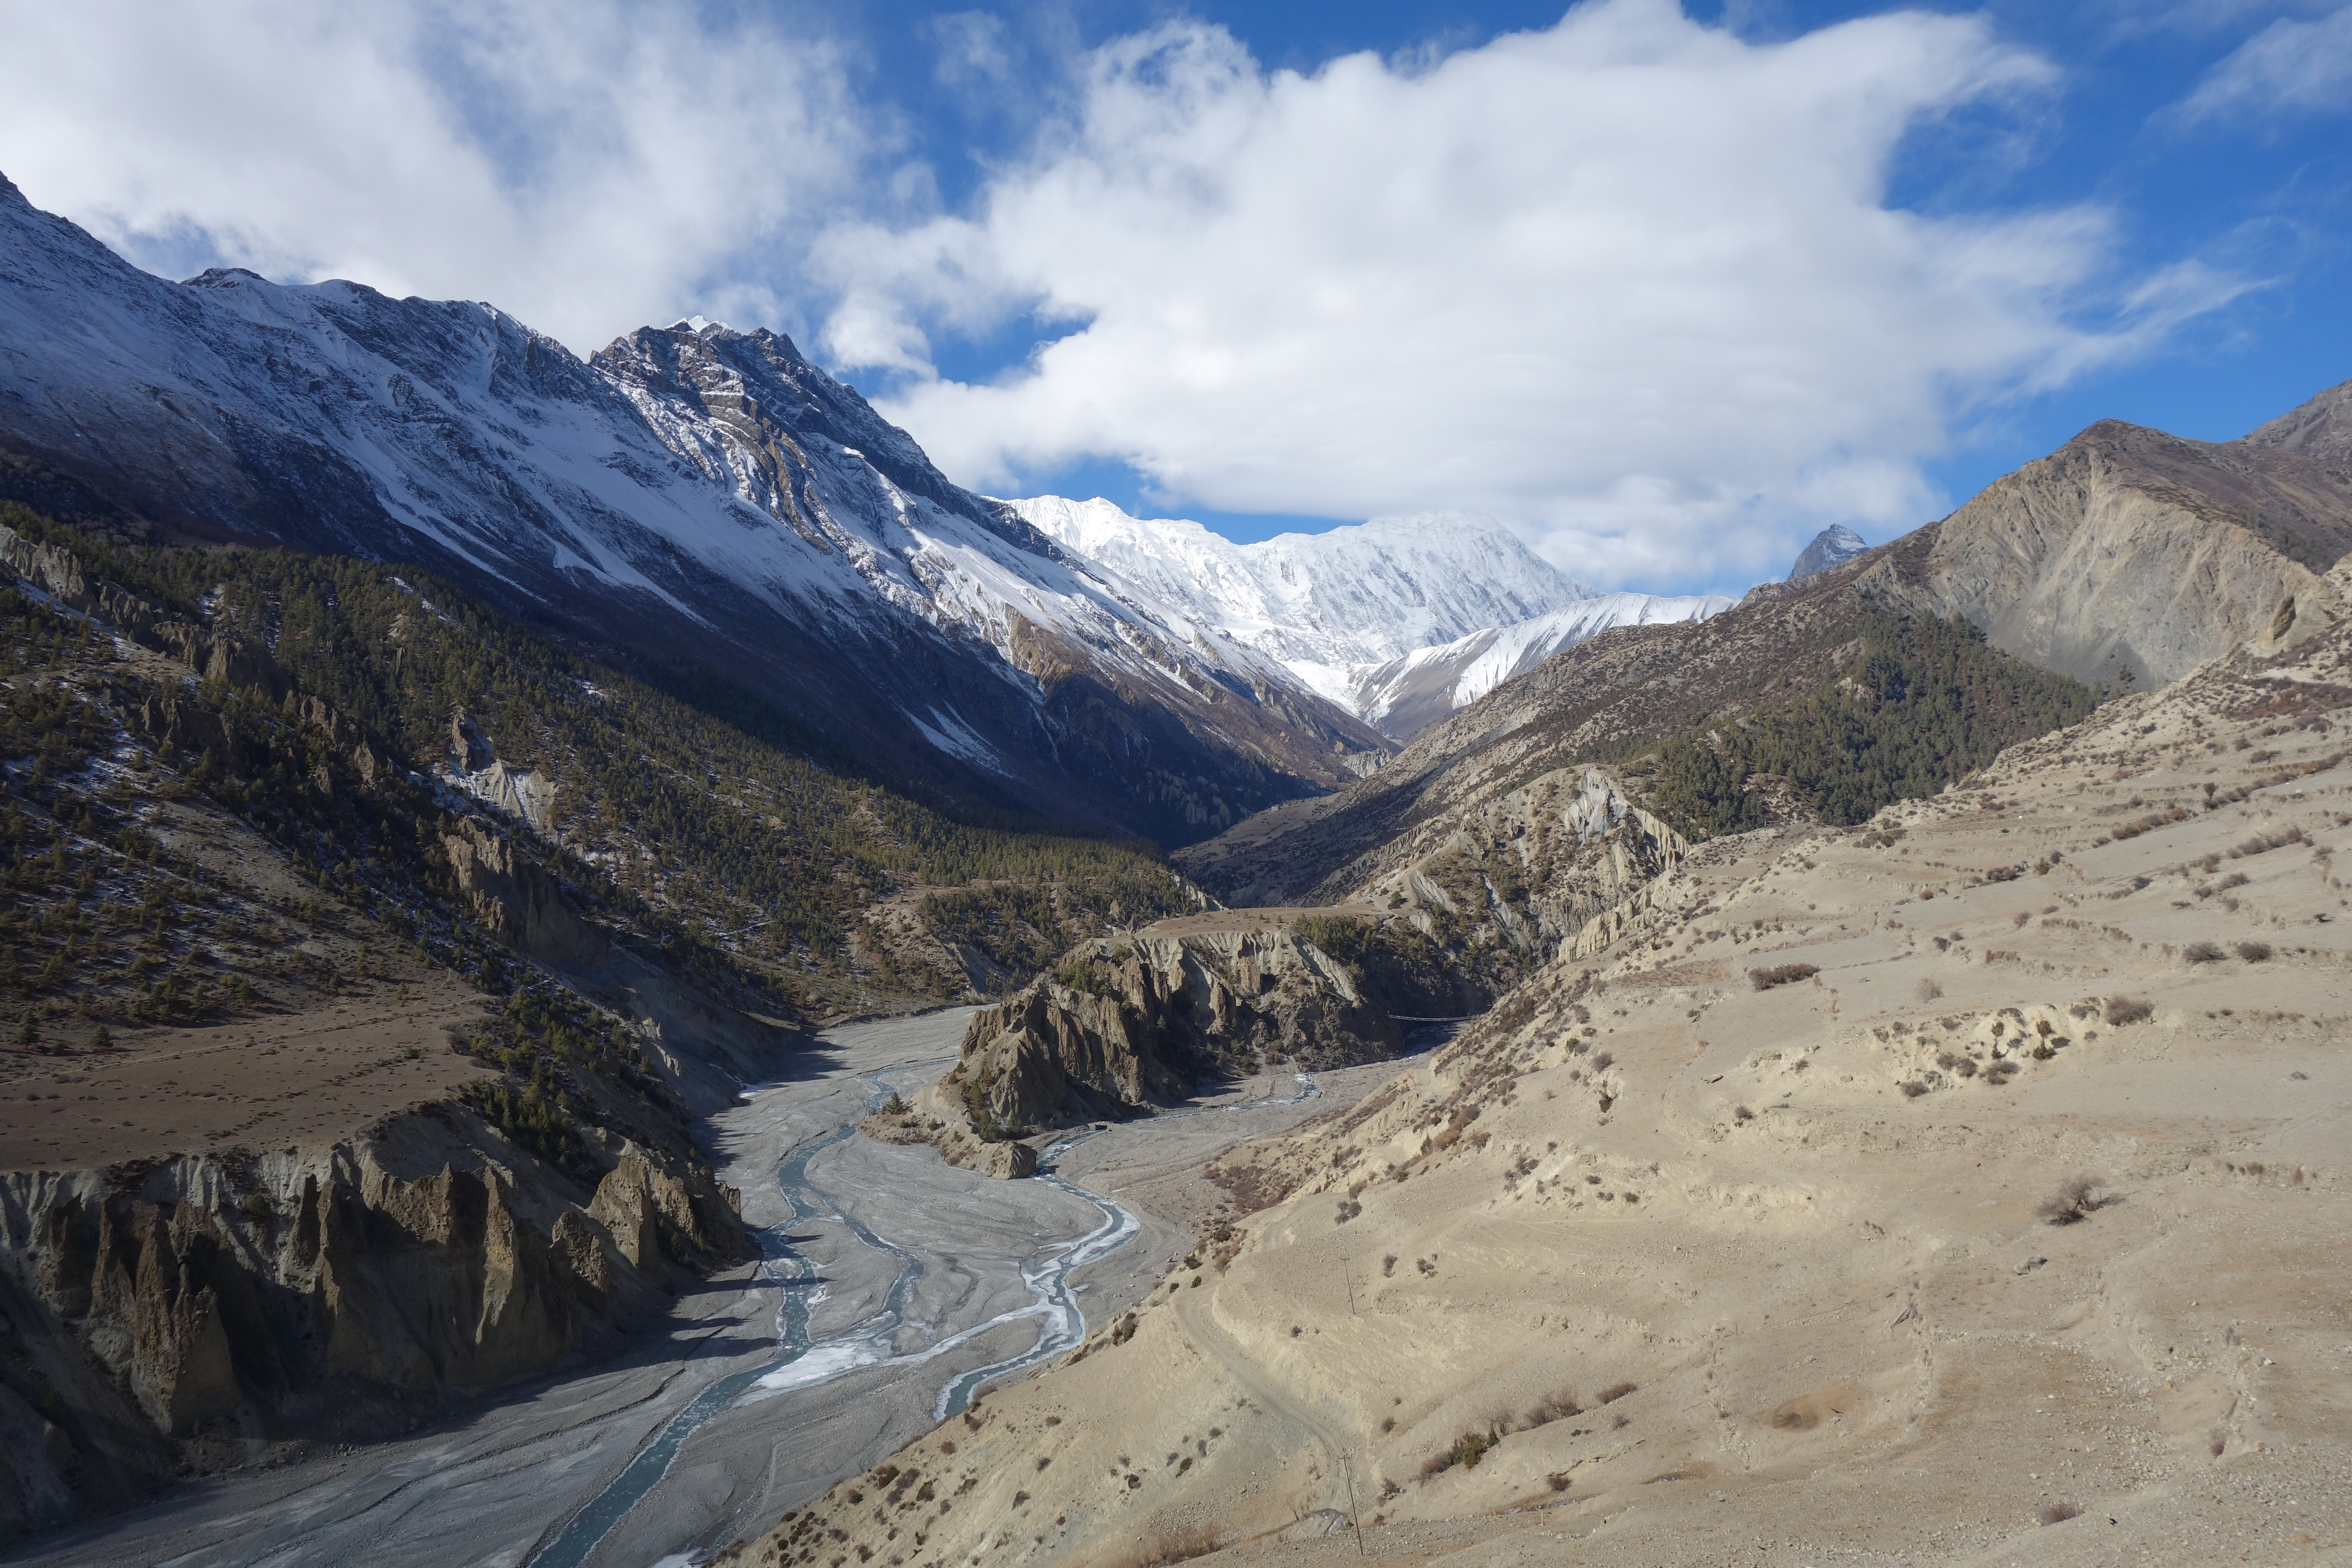 26b9d4428659 Trekking the Annapurna Circuit in winter Part 2  Upper Pisang to Muktinath